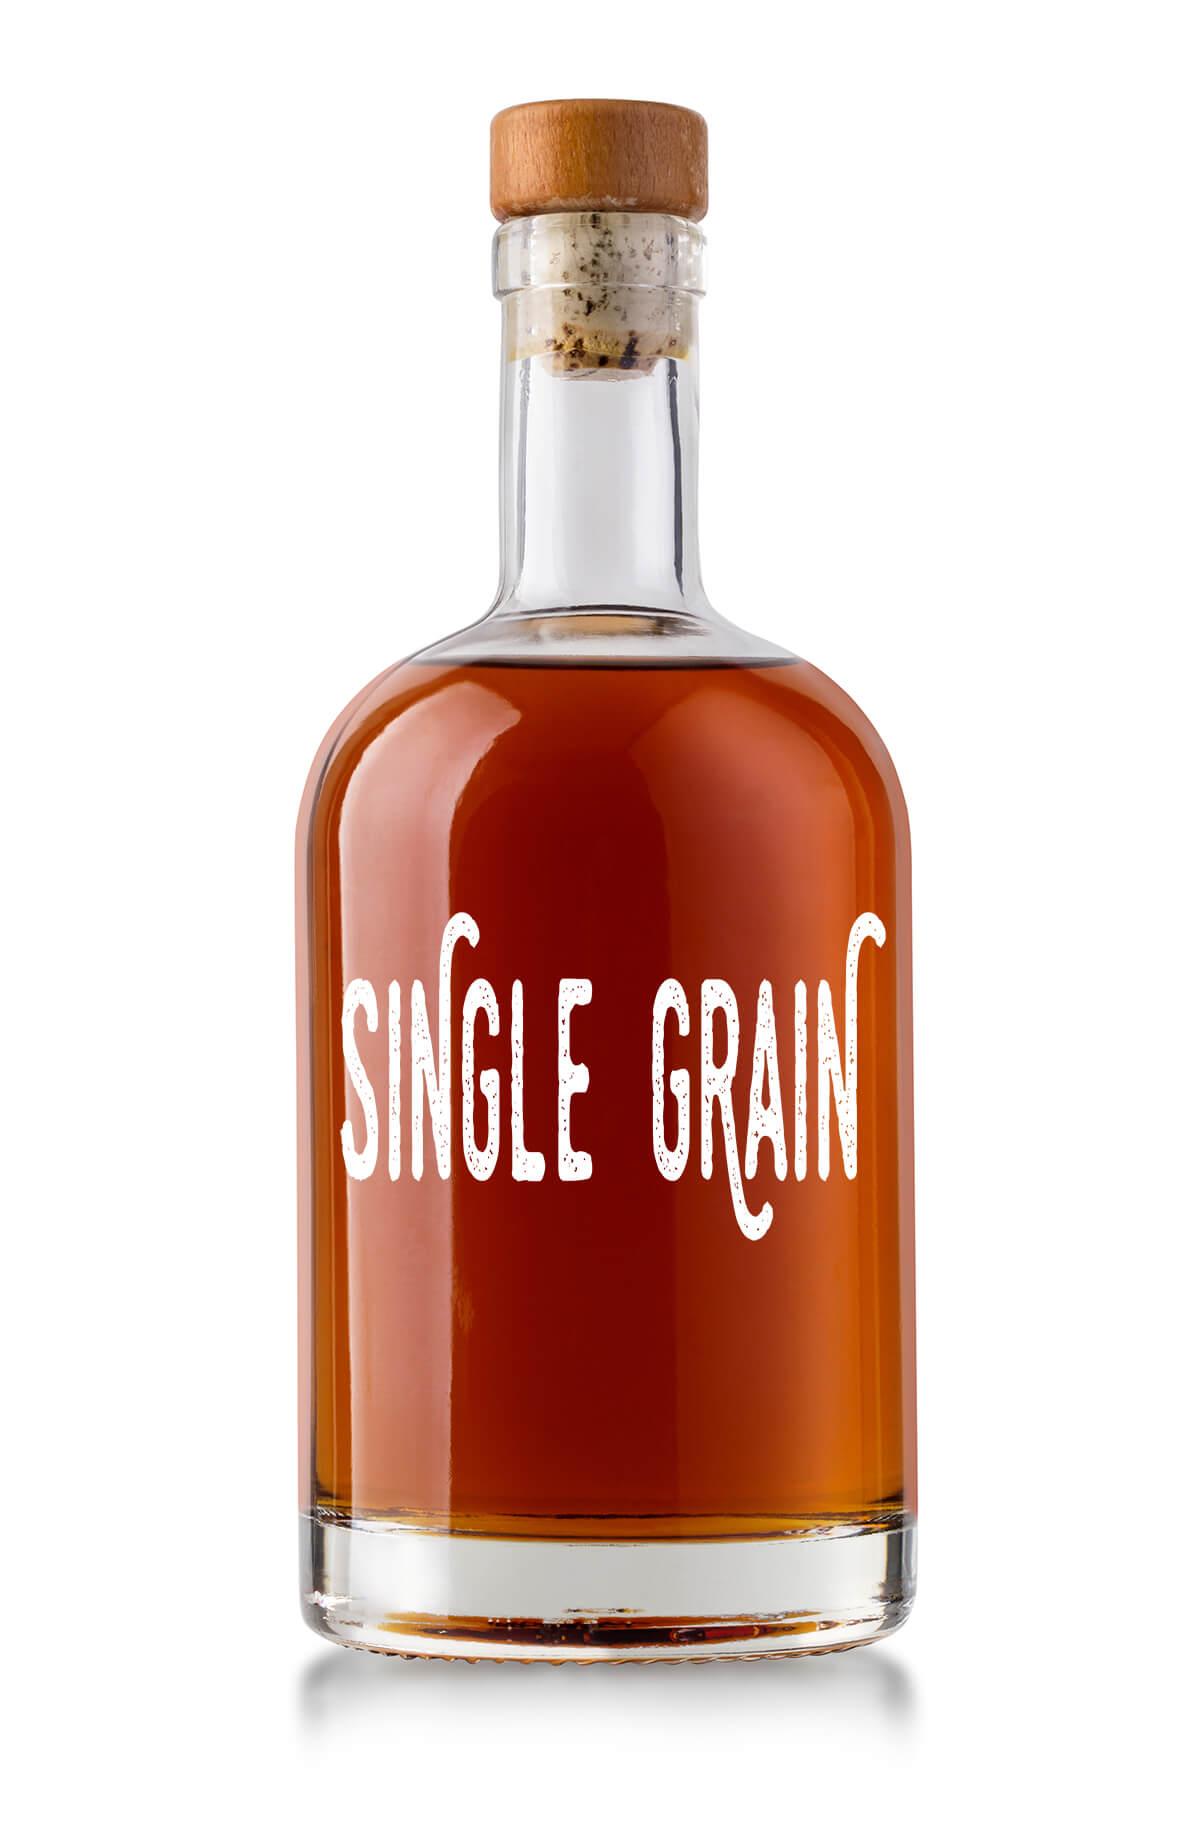 Single Grain Whiskies